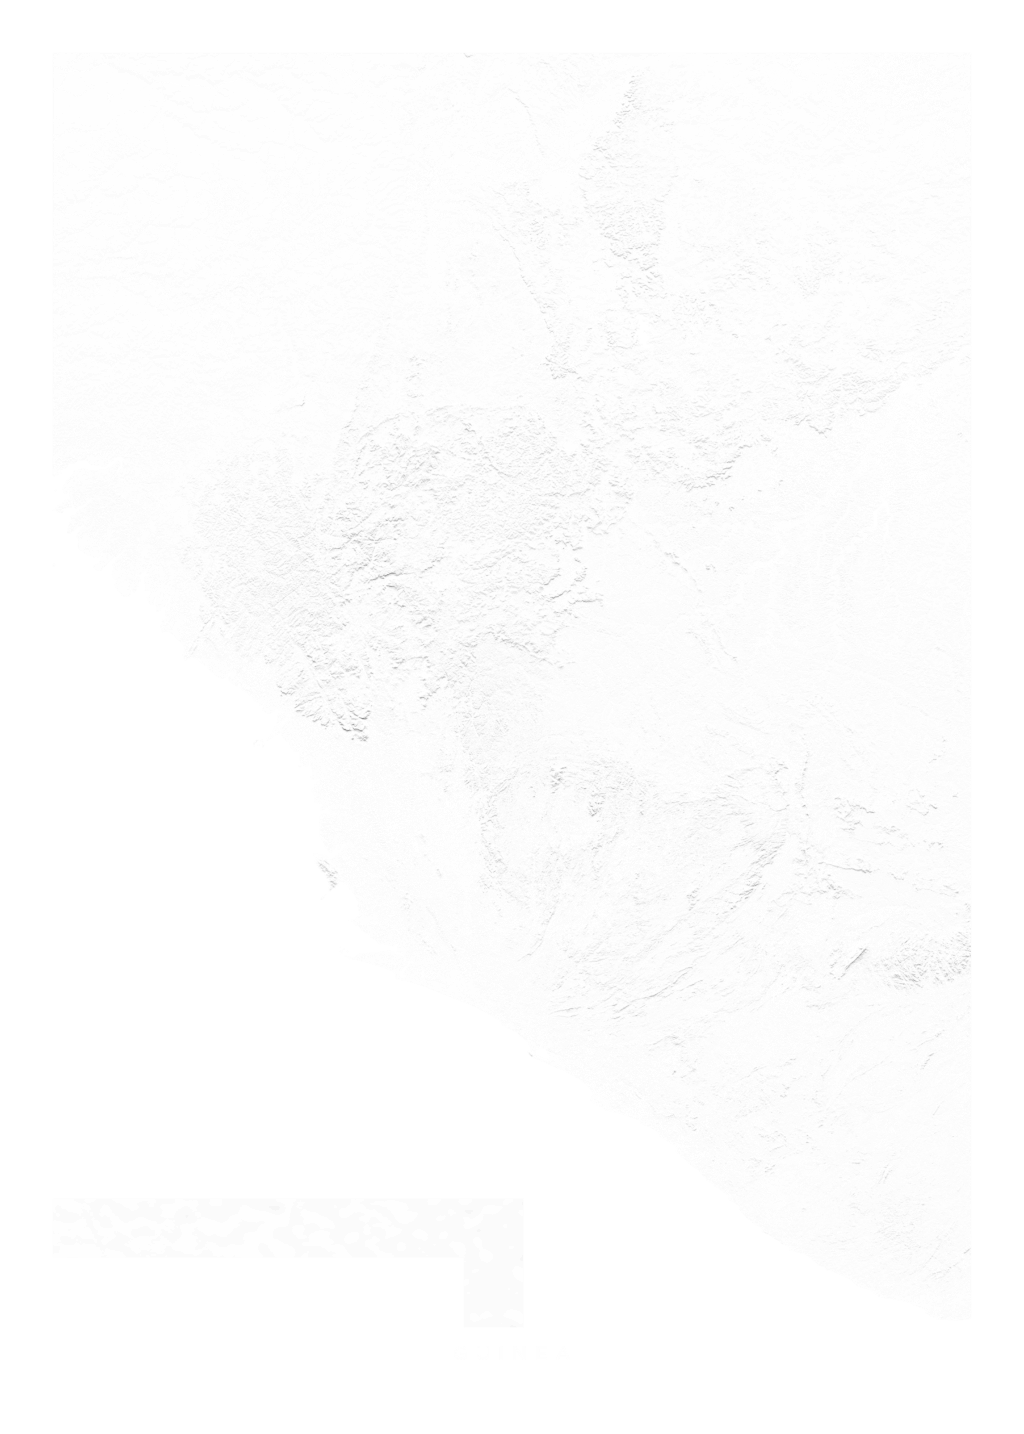 Guinea wall map